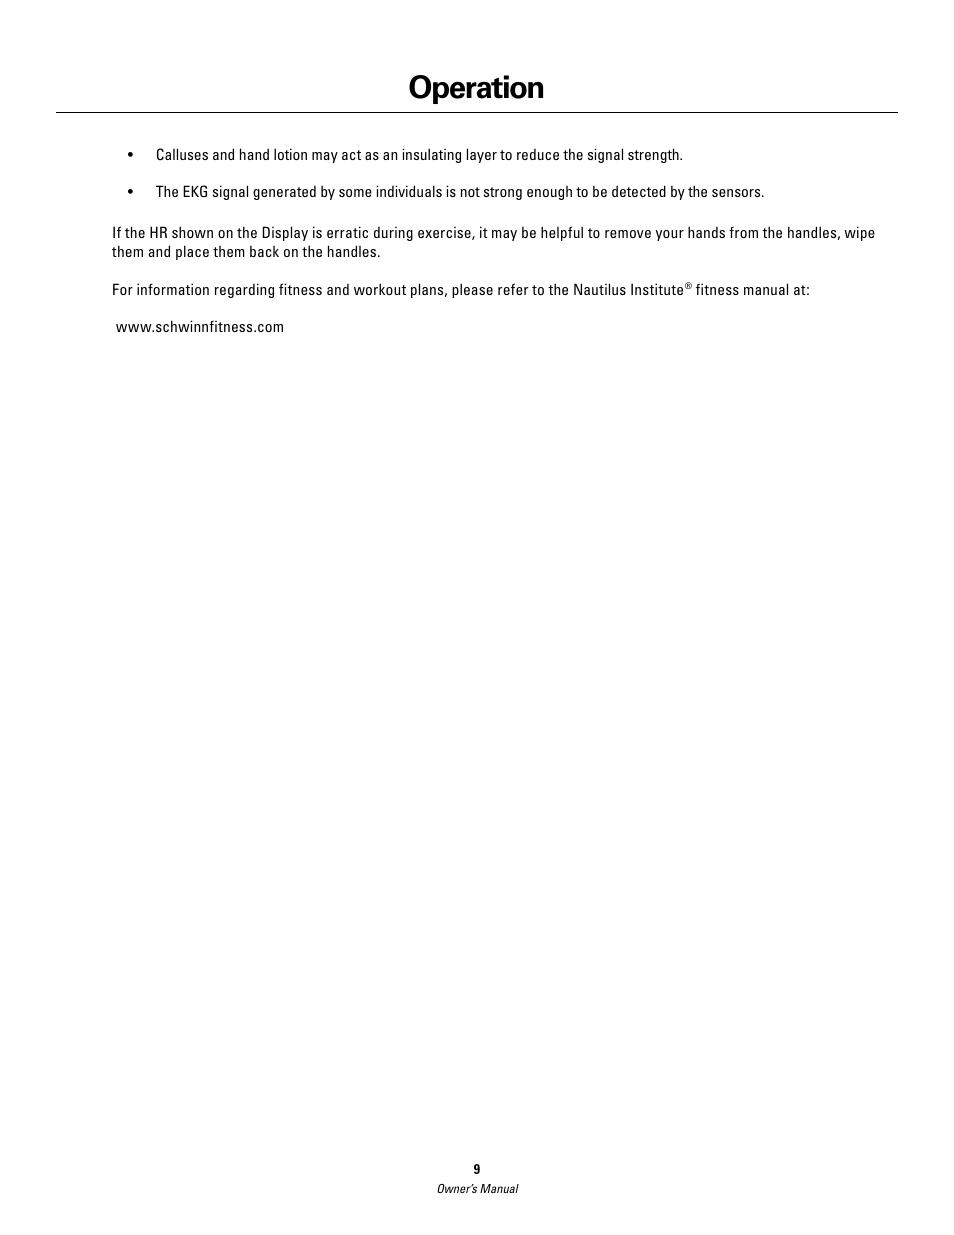 operation schwinn 420 user manual page 9 24 rh manualsdir com Schwinn 420 Elliptical Schwinn 430 Elliptical Manual PDF